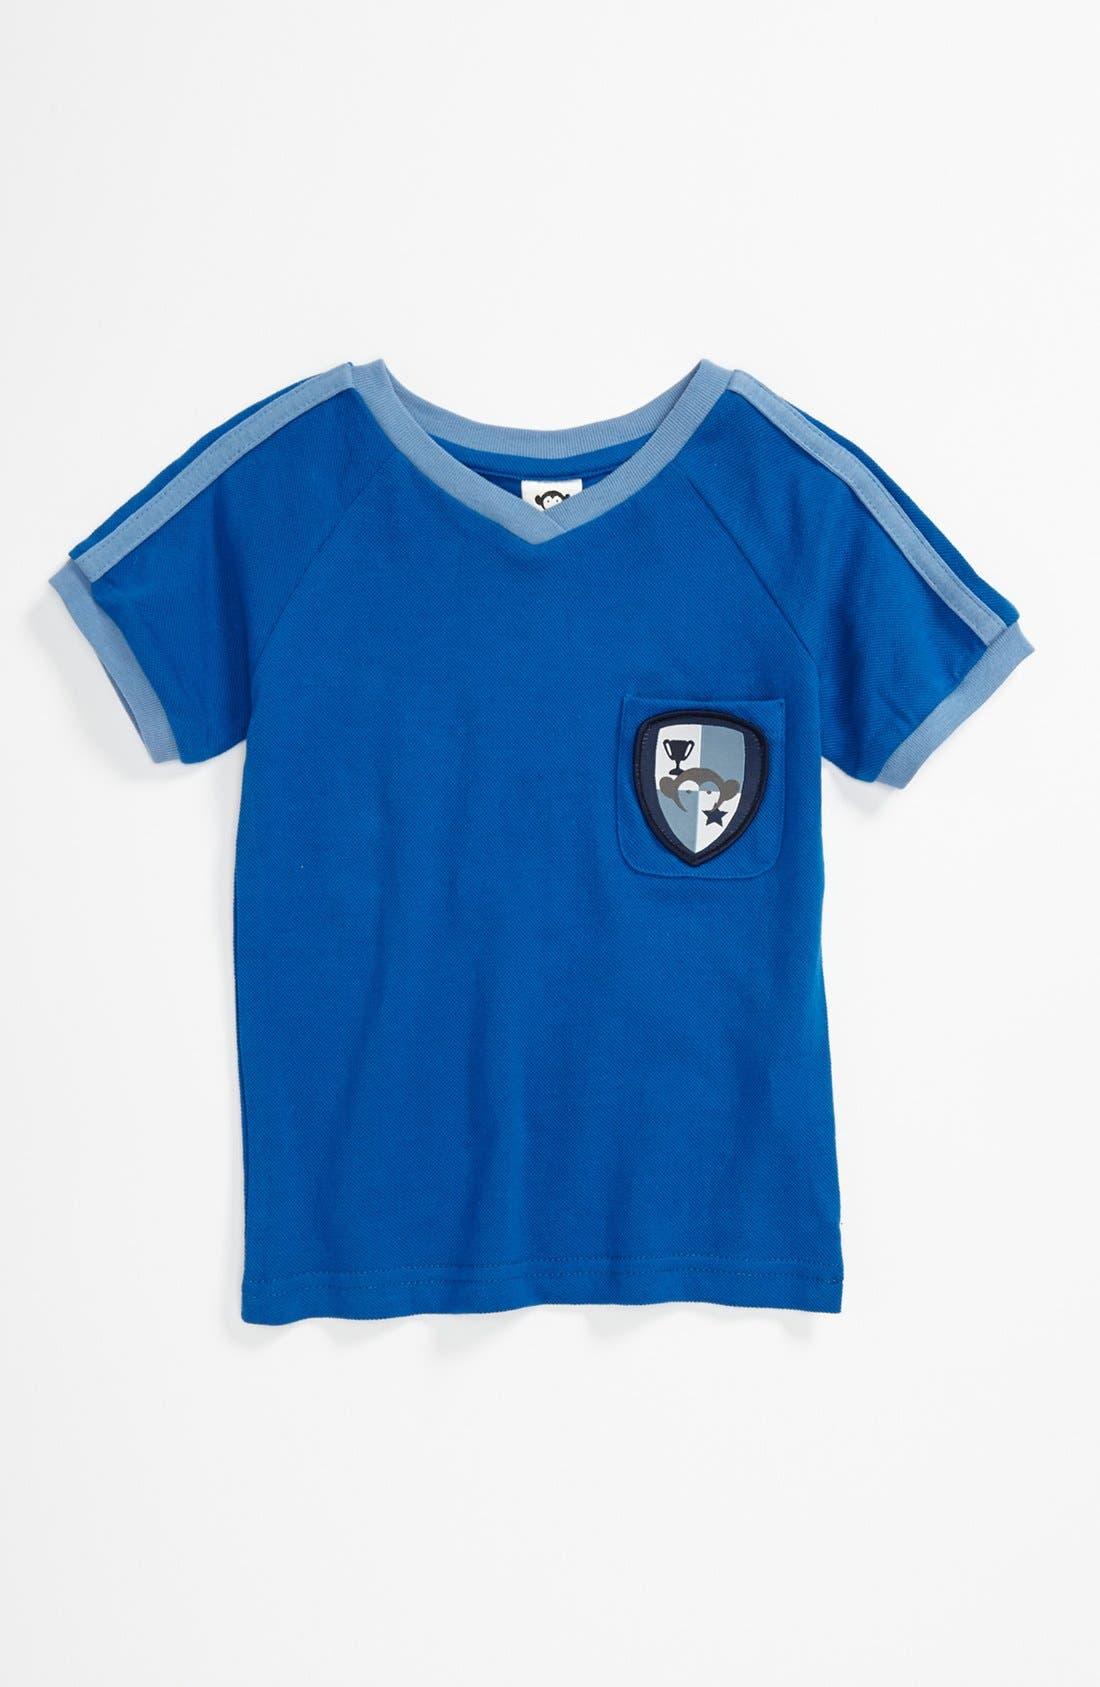 Alternate Image 1 Selected - Appaman 'Soccer' T-Shirt (Toddler)